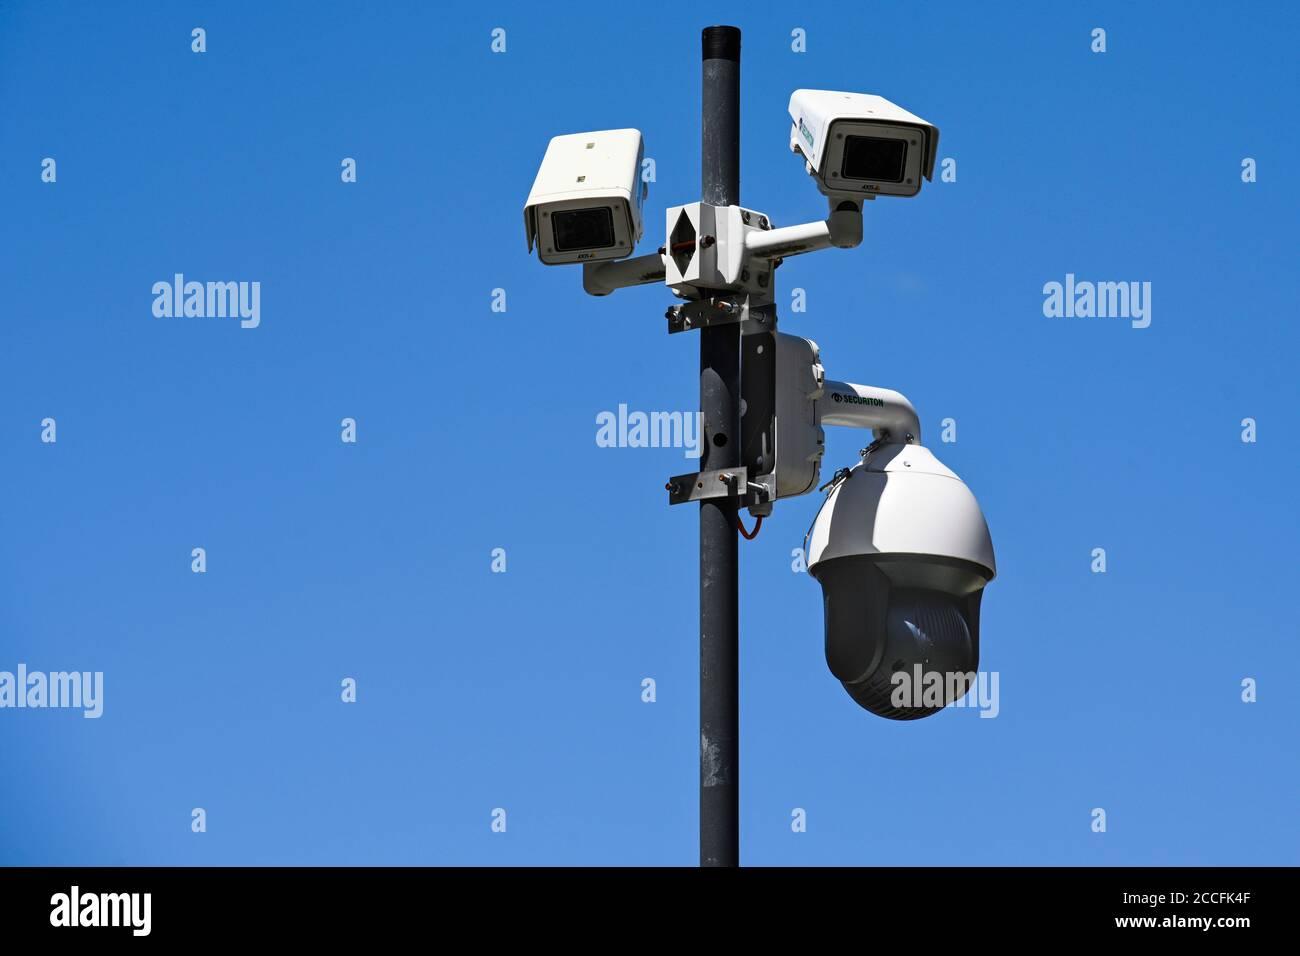 Public security camera Stock Photo